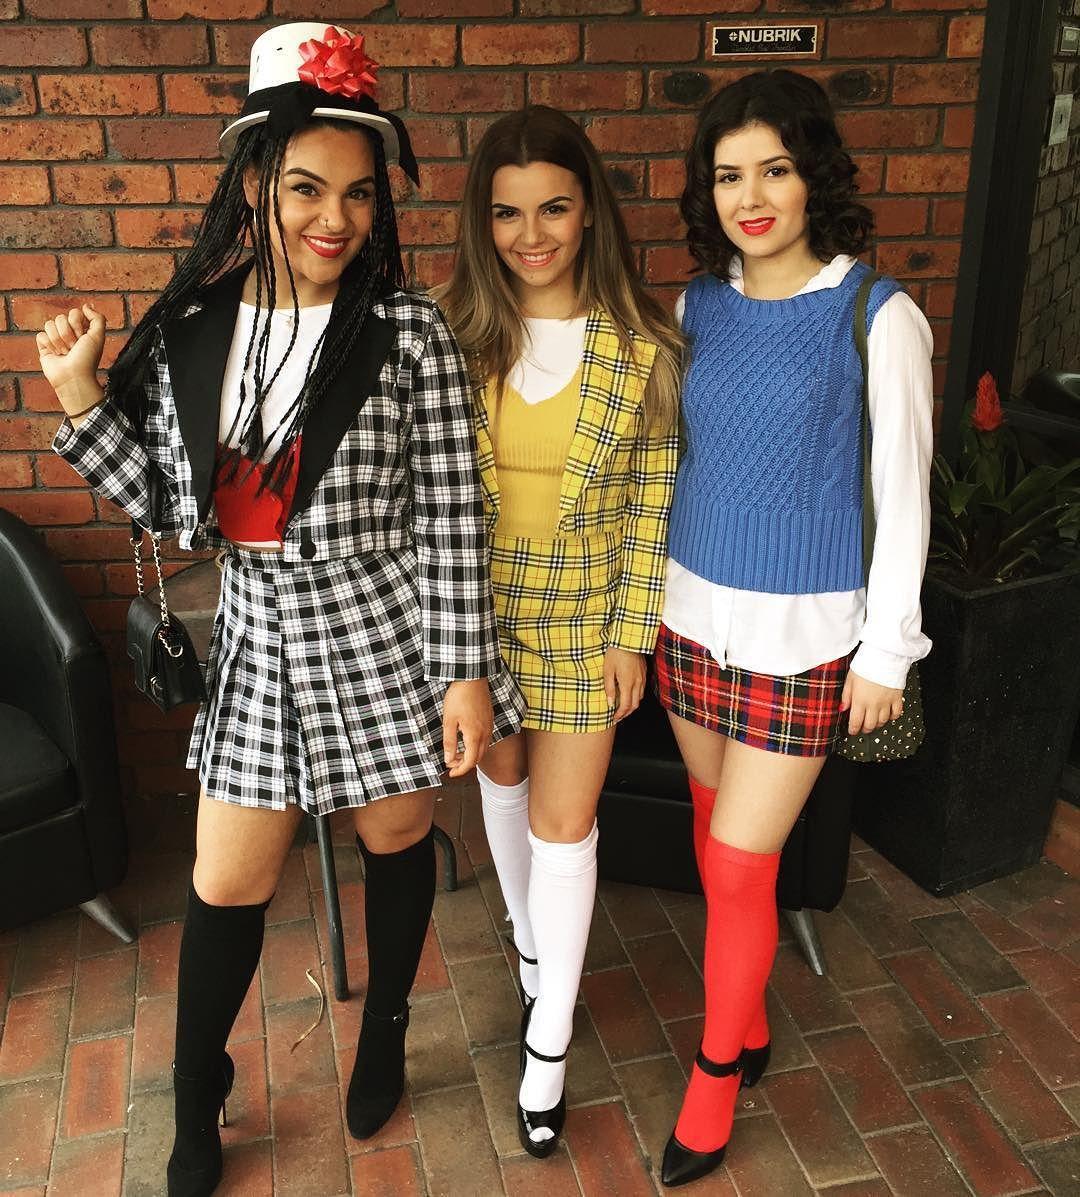 21 DIY Halloween Costume Ideas Thatu0027re Creative Cute u0026 Totally Instagram-Worthy  sc 1 st  Pinterest & 21 DIY Halloween Costume Ideas Thatu0027re Creative Cute u0026 Totally ...